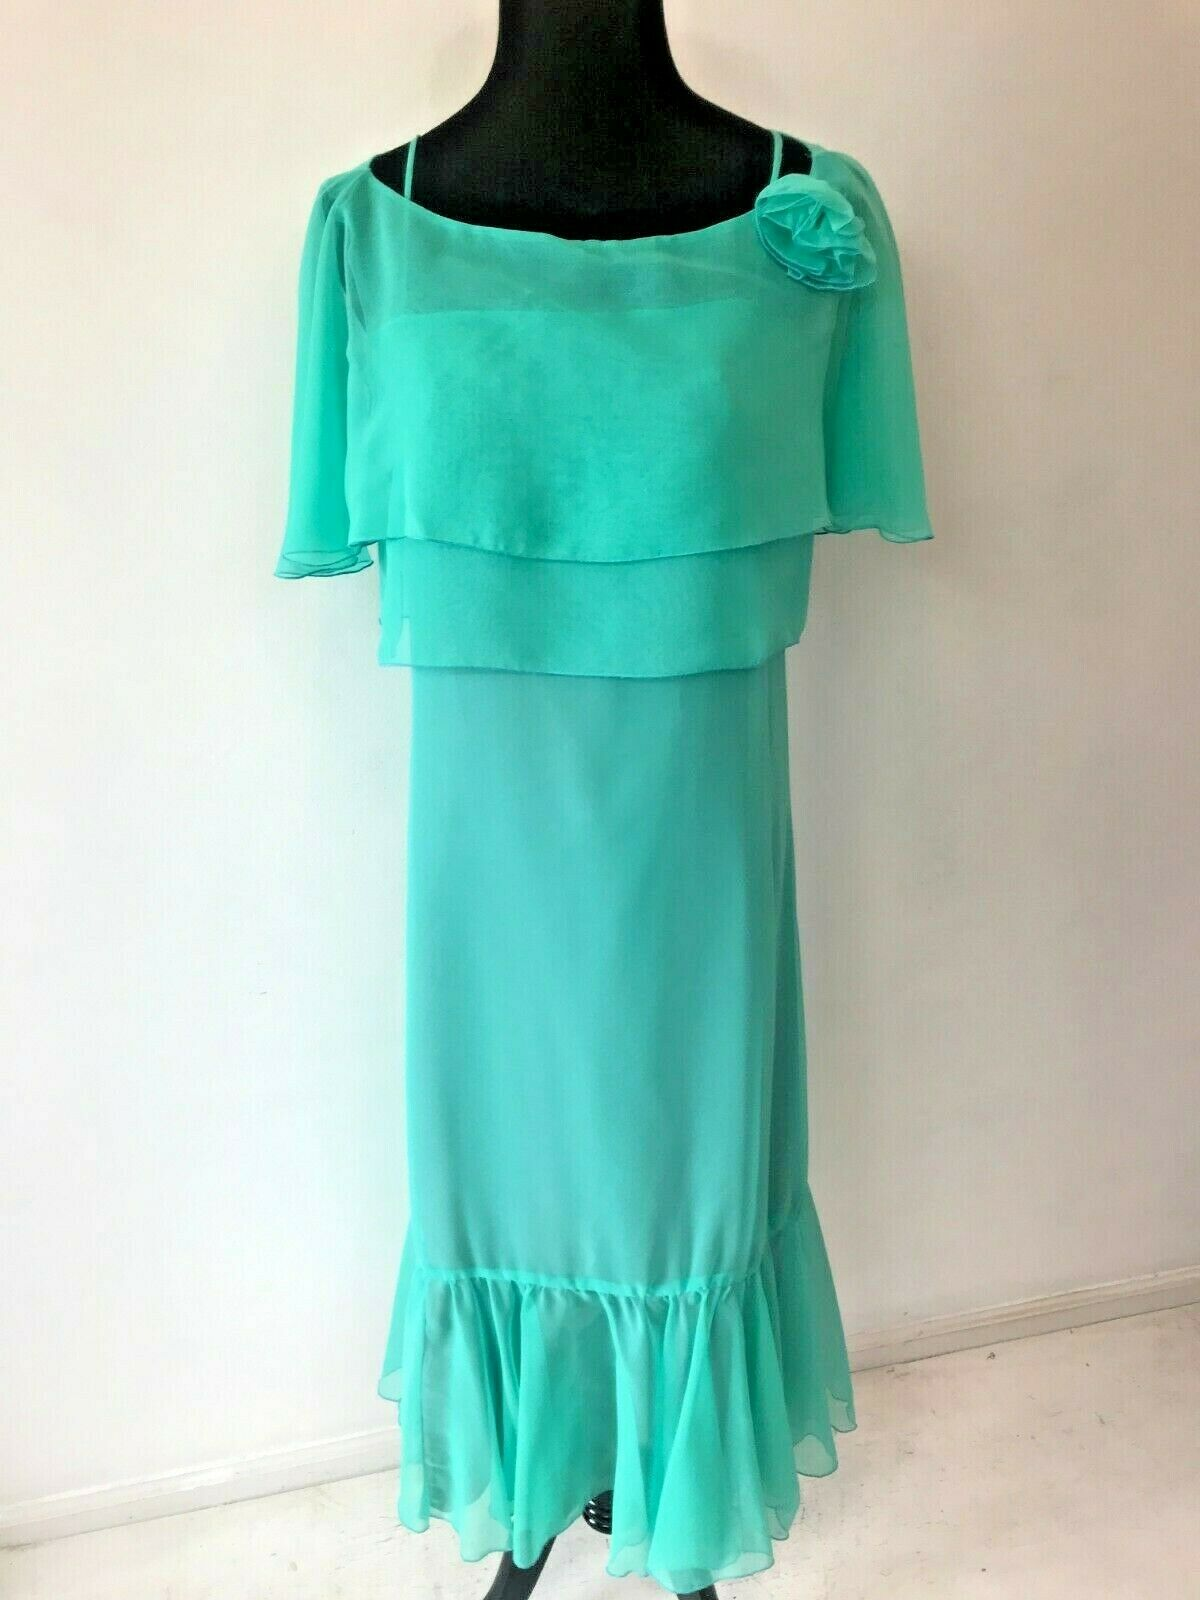 Vintage 1970s House of Bianchi Maxi Dress size S Mint Green Chiffon Prairie DS13